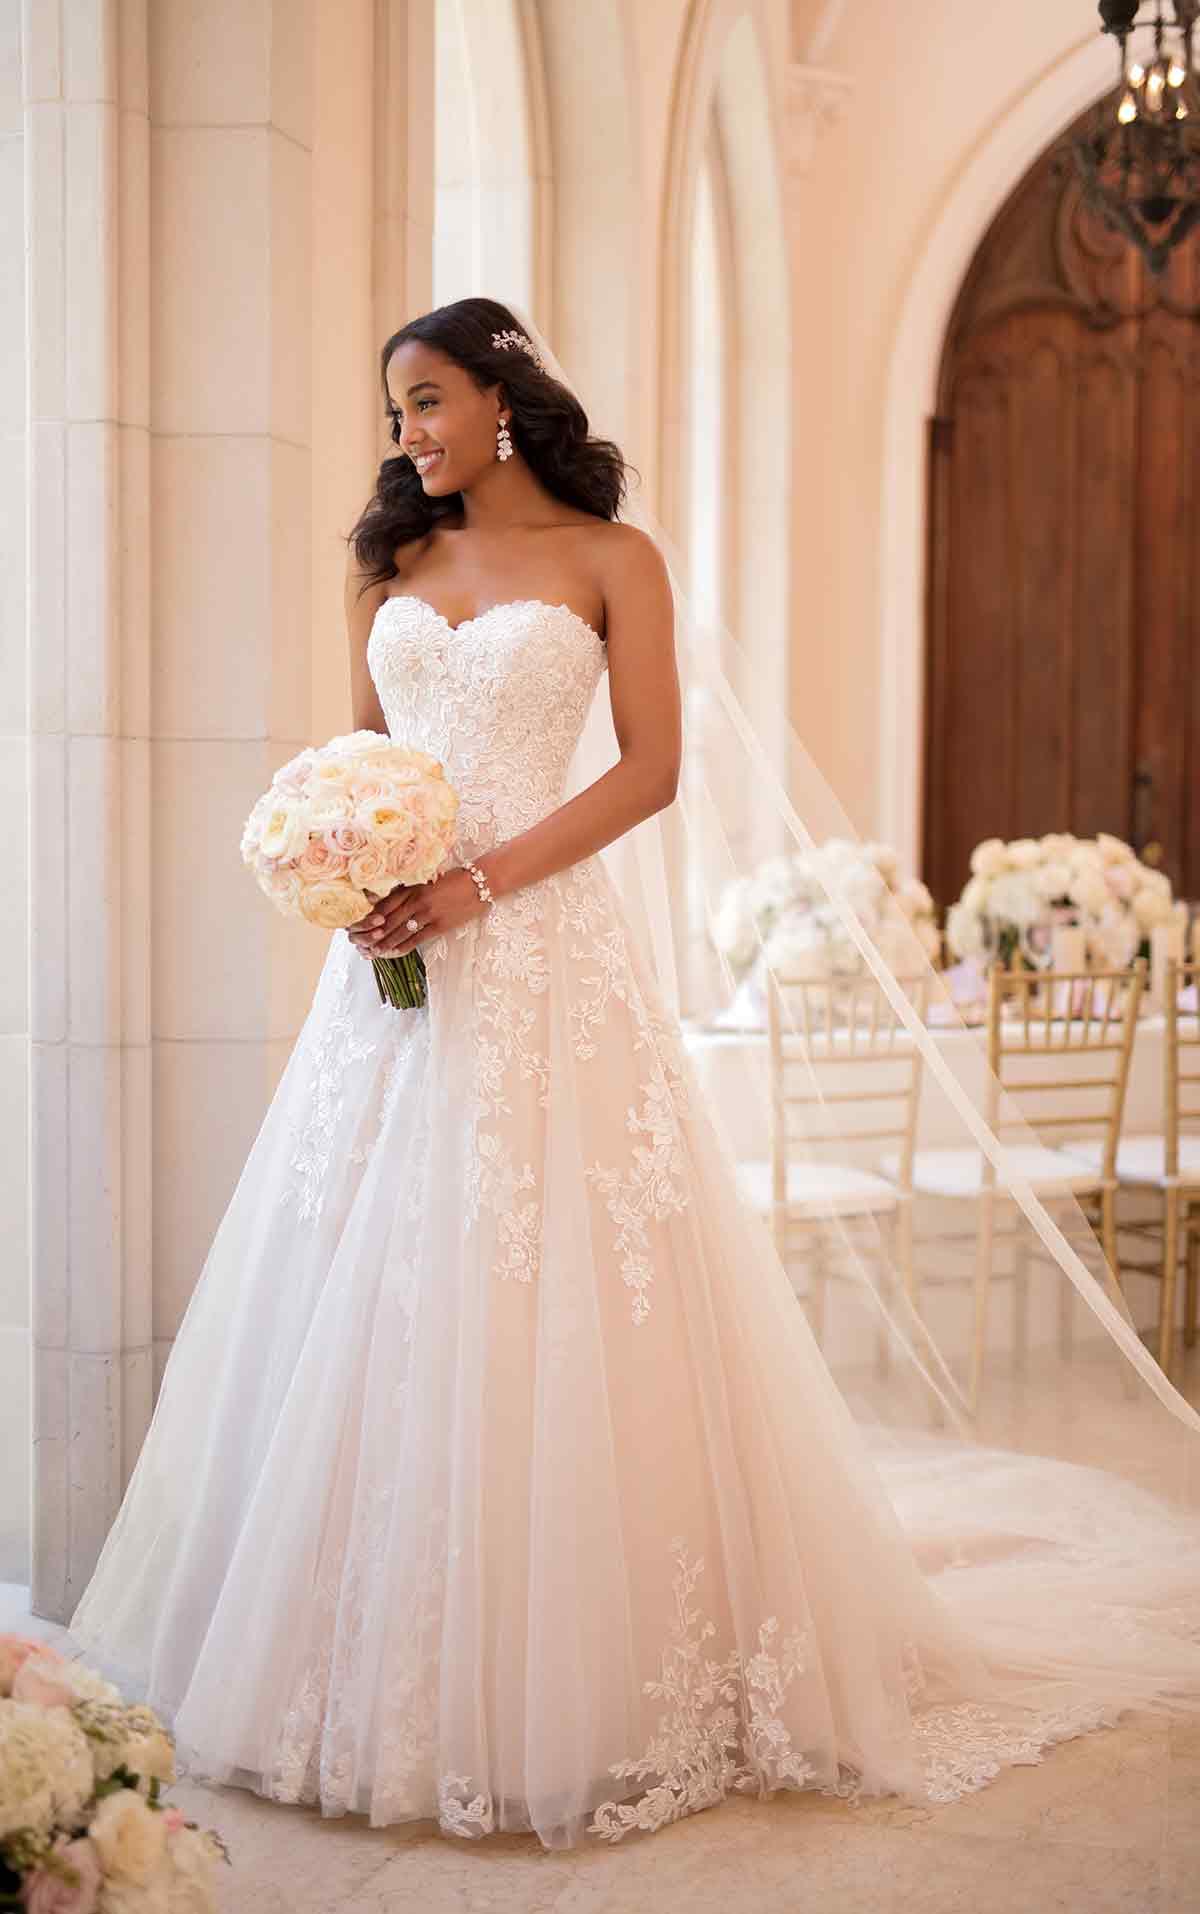 7faa960a46a2 Affordable Wedding Dress Designer Stella York Reveals New Spring ...